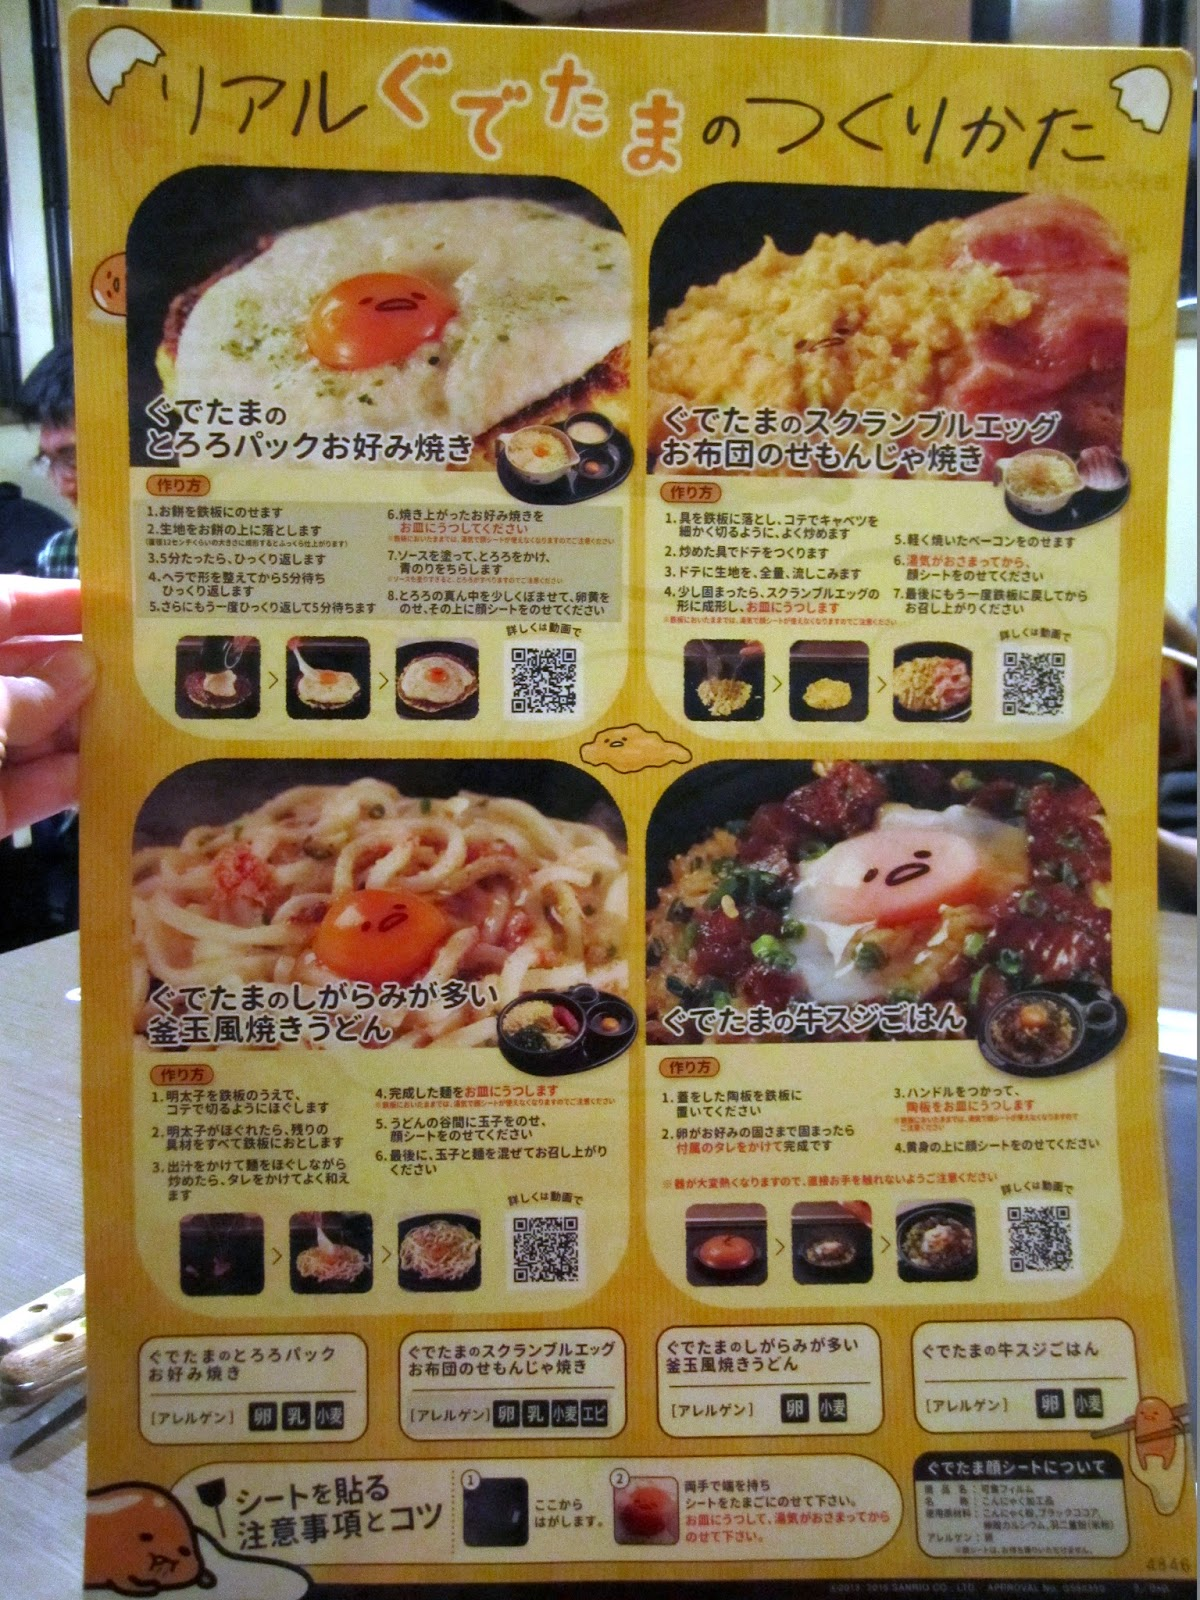 Gudetama x Dohtonbori Collaboration Campaign Menu 十和田市 ぐでたまx道頓堀コラブキャンペインメニュー